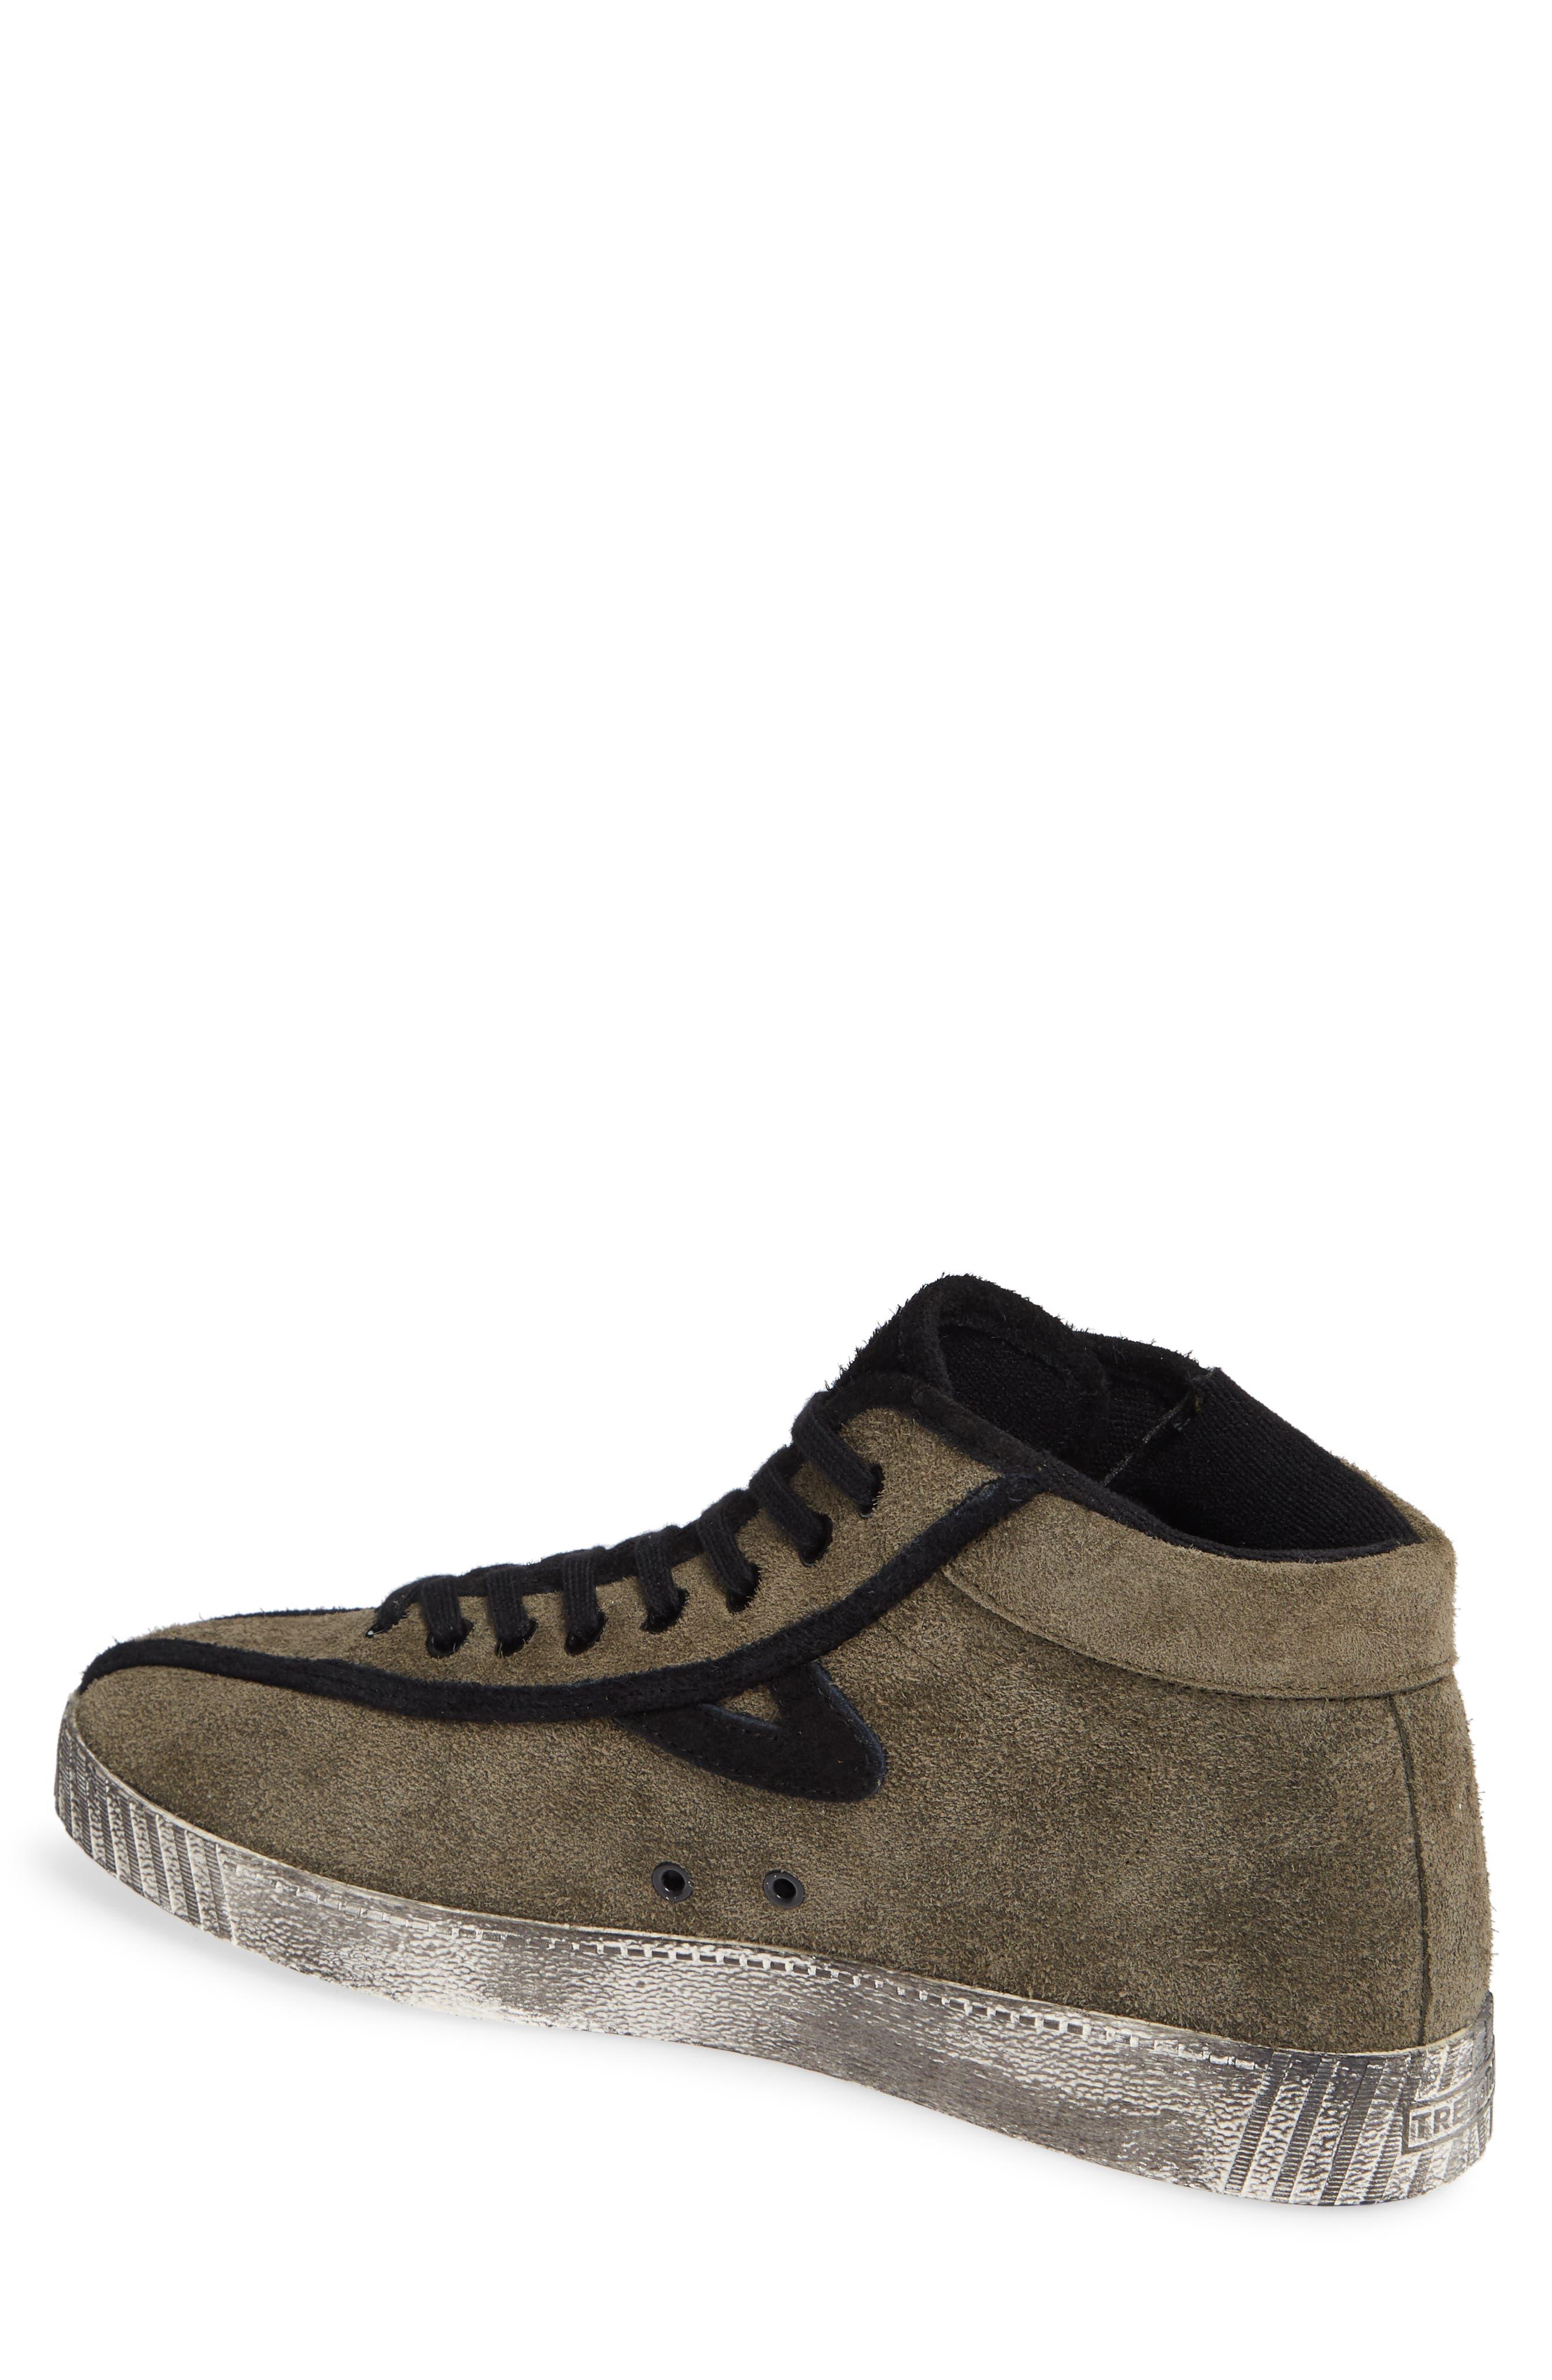 Nylite Hi 21 High Top Sneaker,                             Alternate thumbnail 2, color,                             OLIVE/ BLACK SUEDE